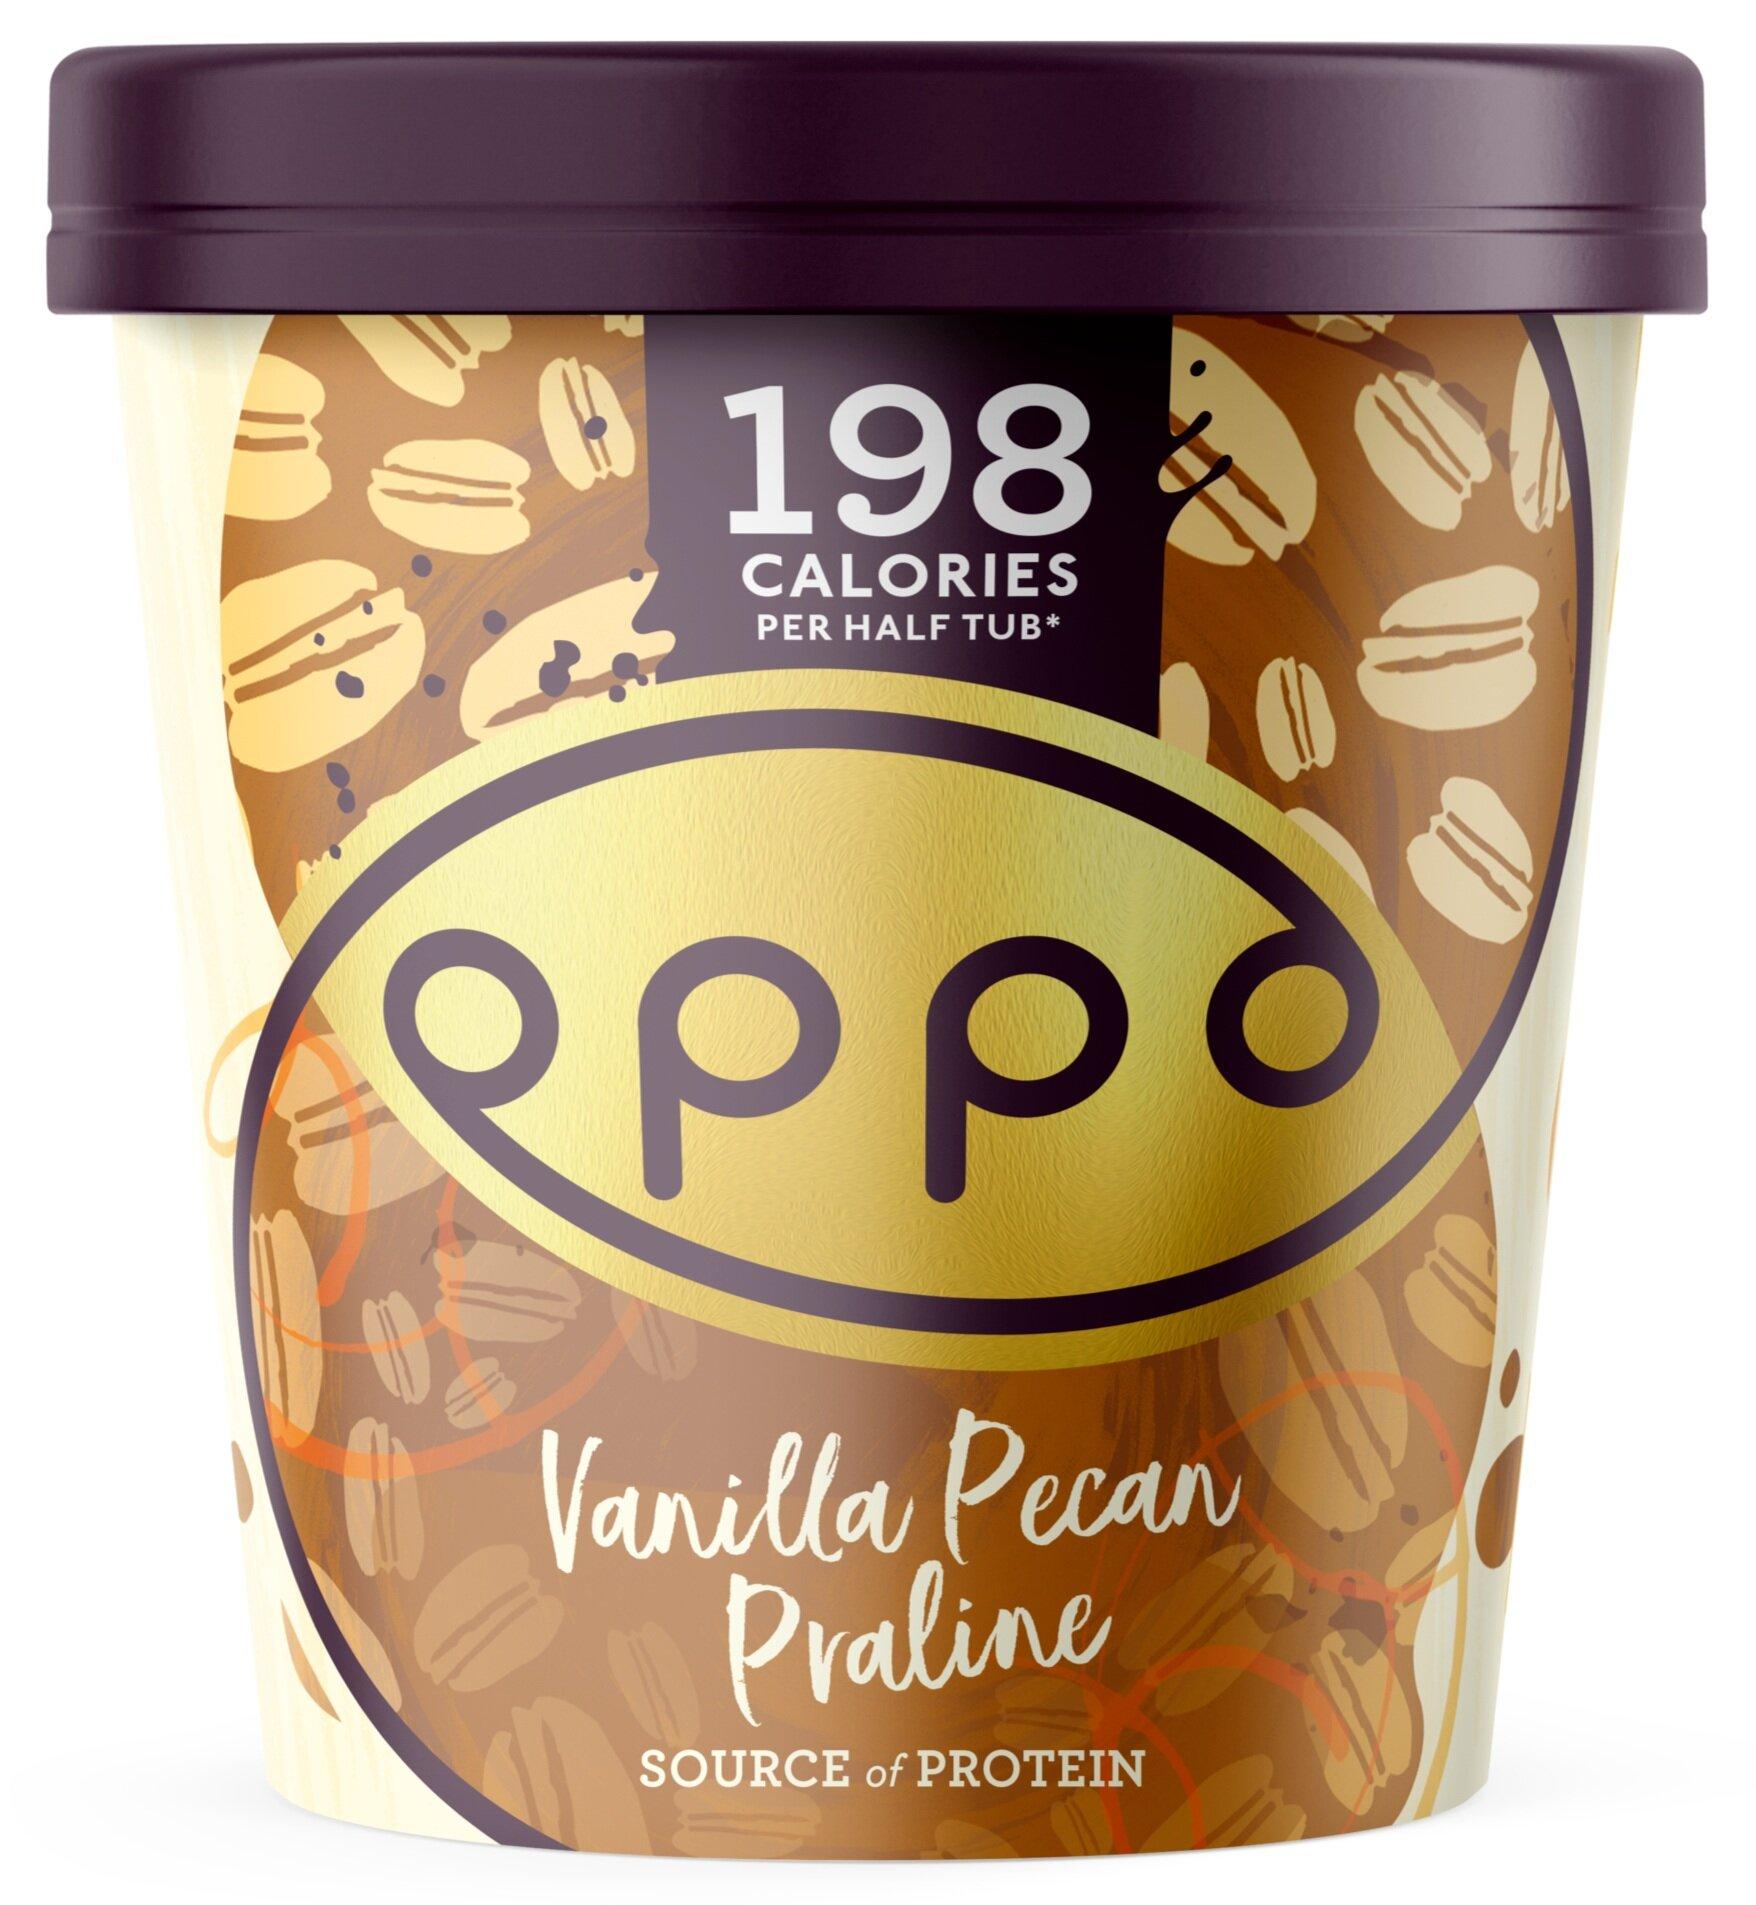 Oppo+475ml+Vanilla+Pecan+Praline.jpg